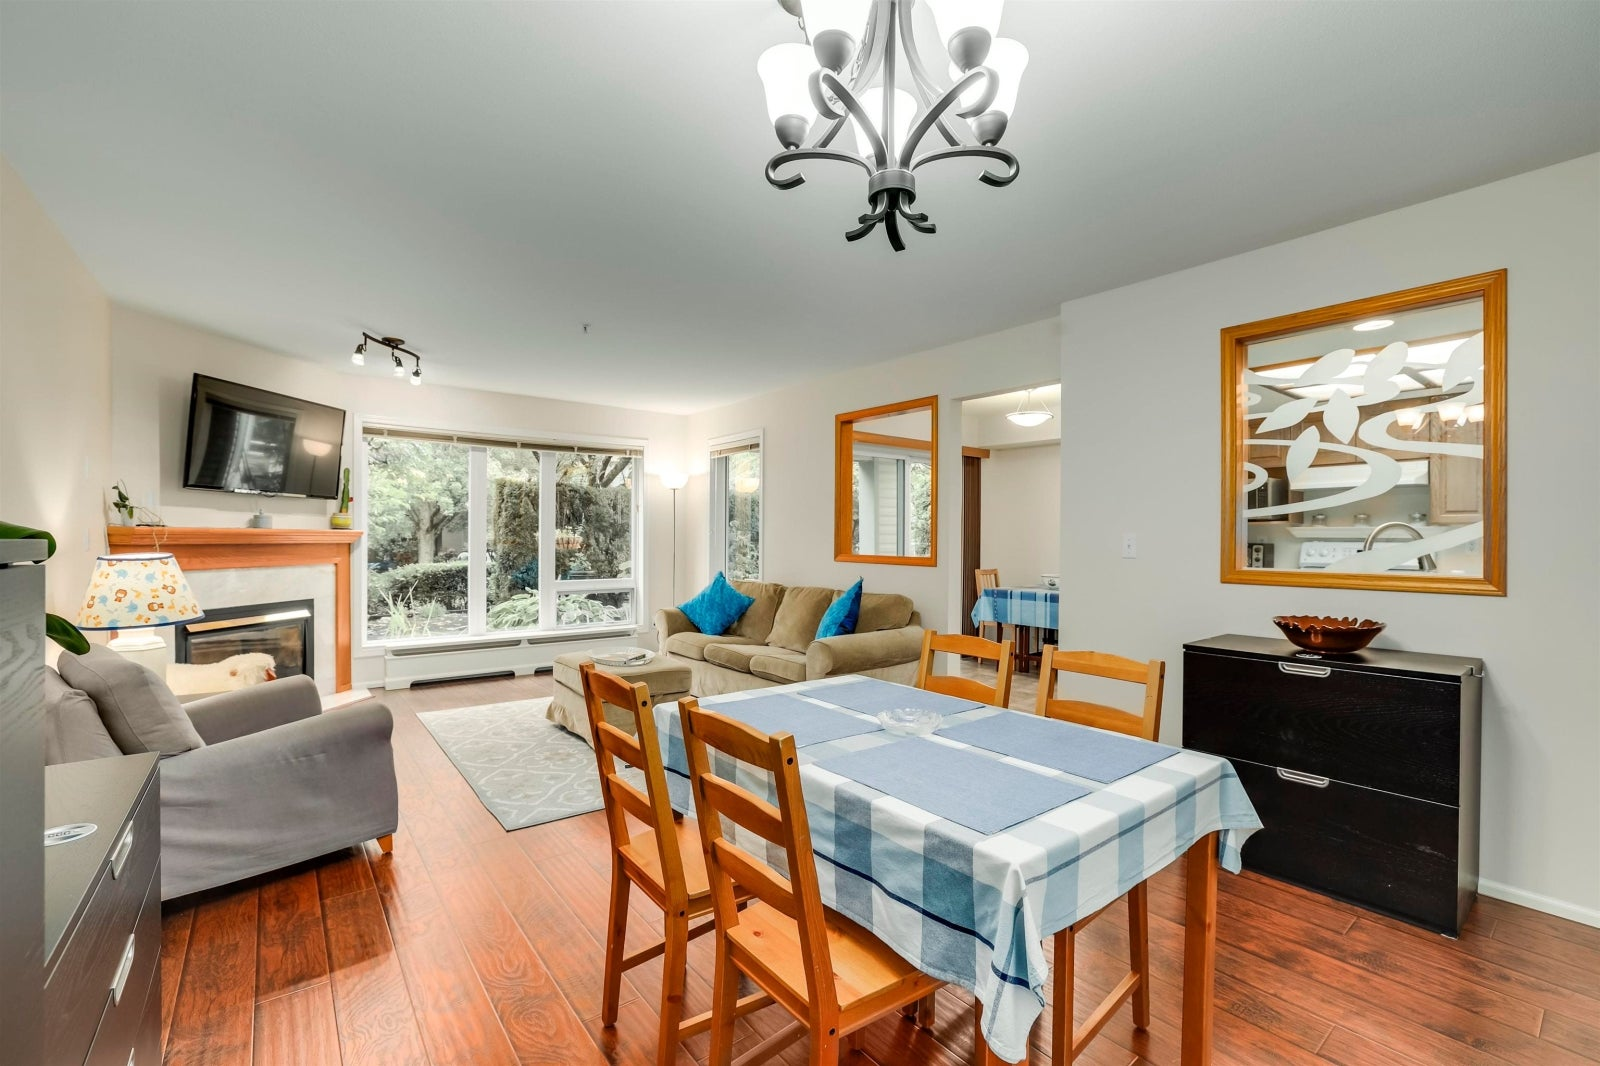 103 1132 DUFFERIN STREET - Eagle Ridge CQ Apartment/Condo for sale, 2 Bedrooms (R2618654) #7